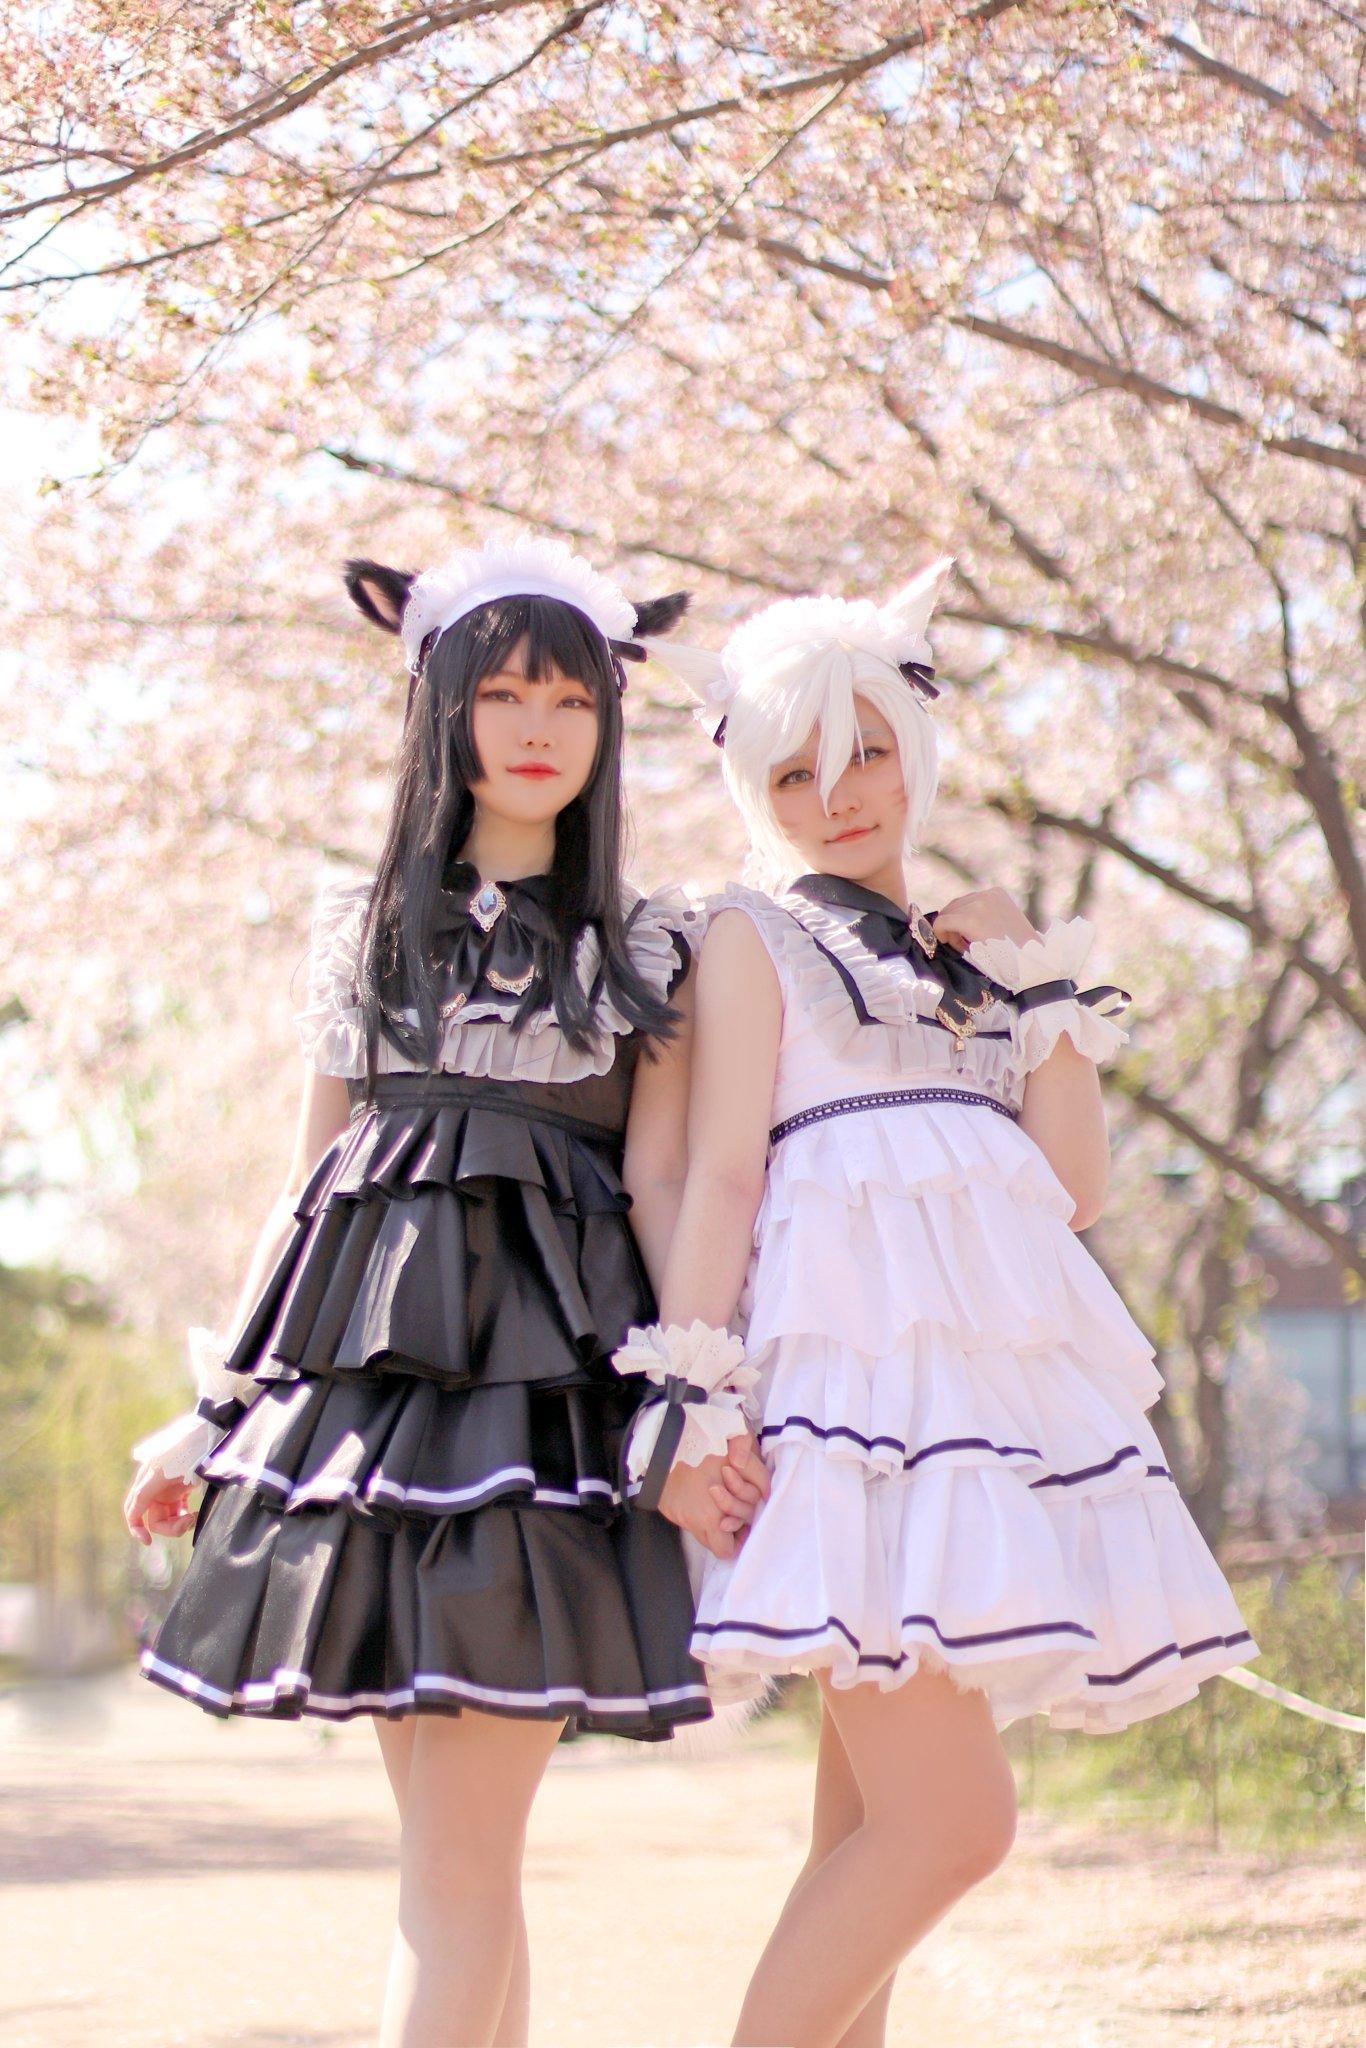 Causa Ffxiv On Twitter Quaintrelle S Ruffled Dress W Coslum P R Ff14 Ffxiv Miqote [ 2048 x 1366 Pixel ]